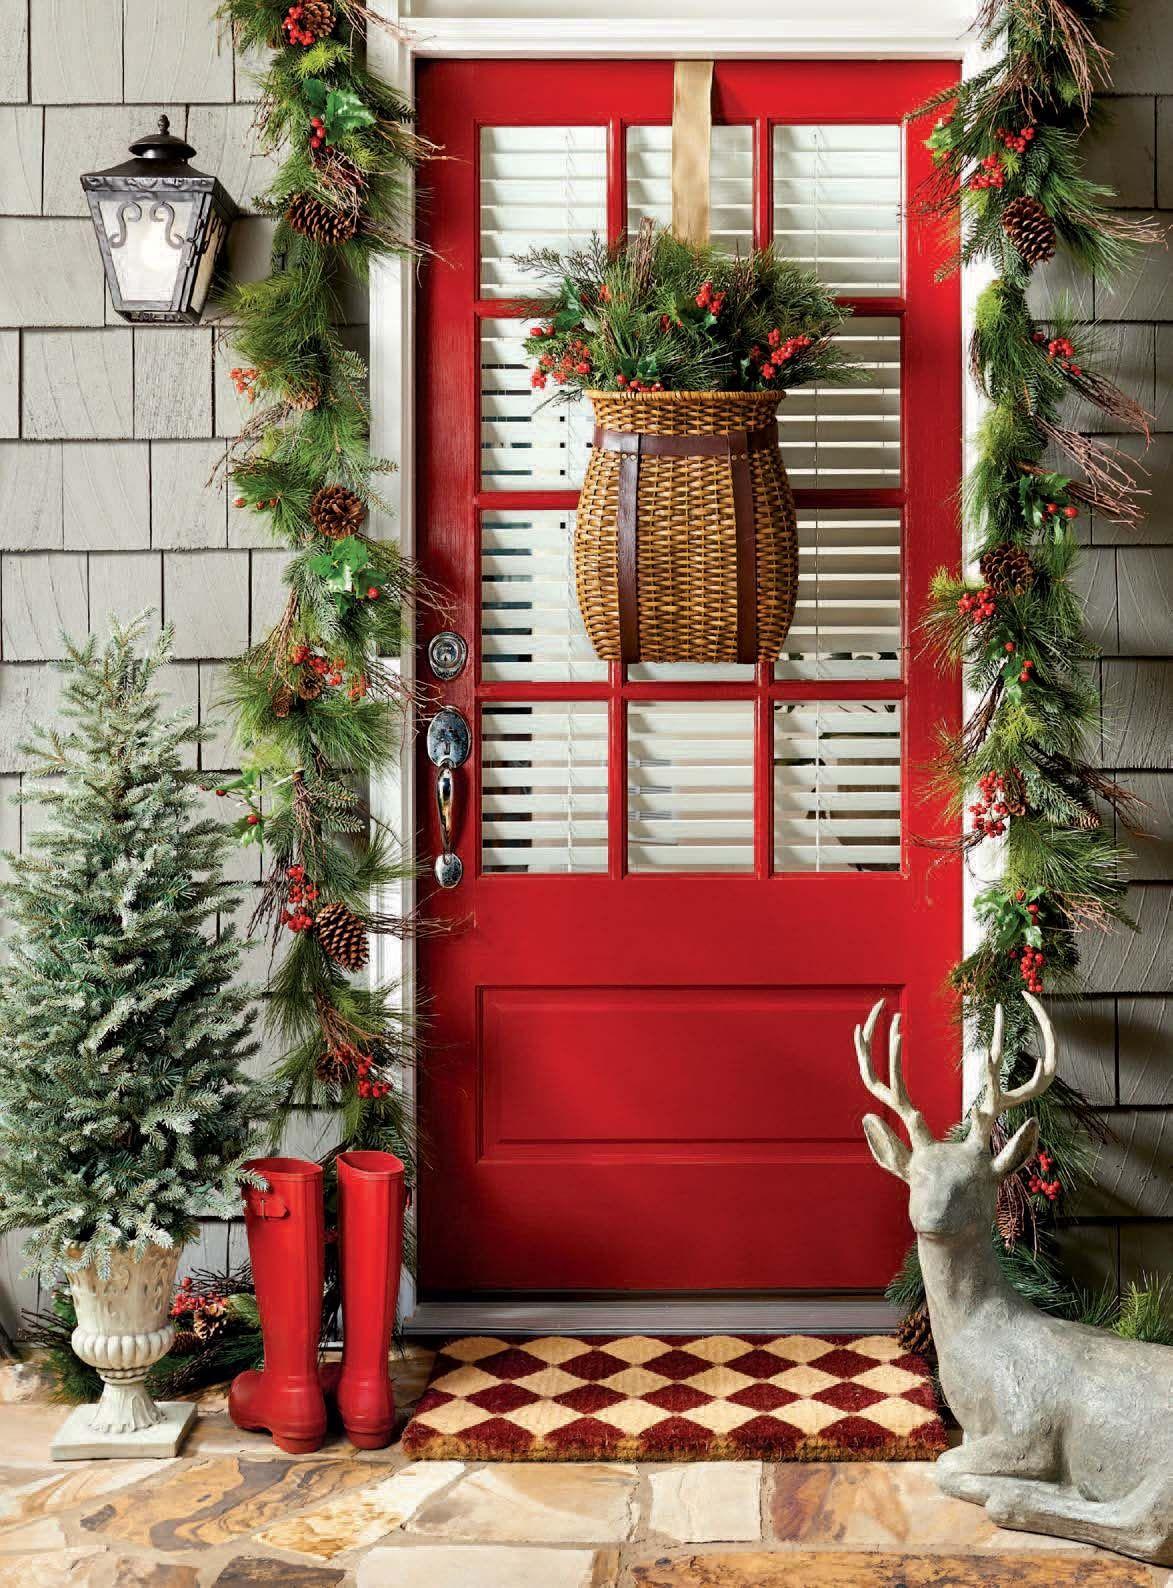 christmas decor ideas rustic country 15 1 kindesign 40 Fabulous Rustic Country Christmas Decorating Ideas